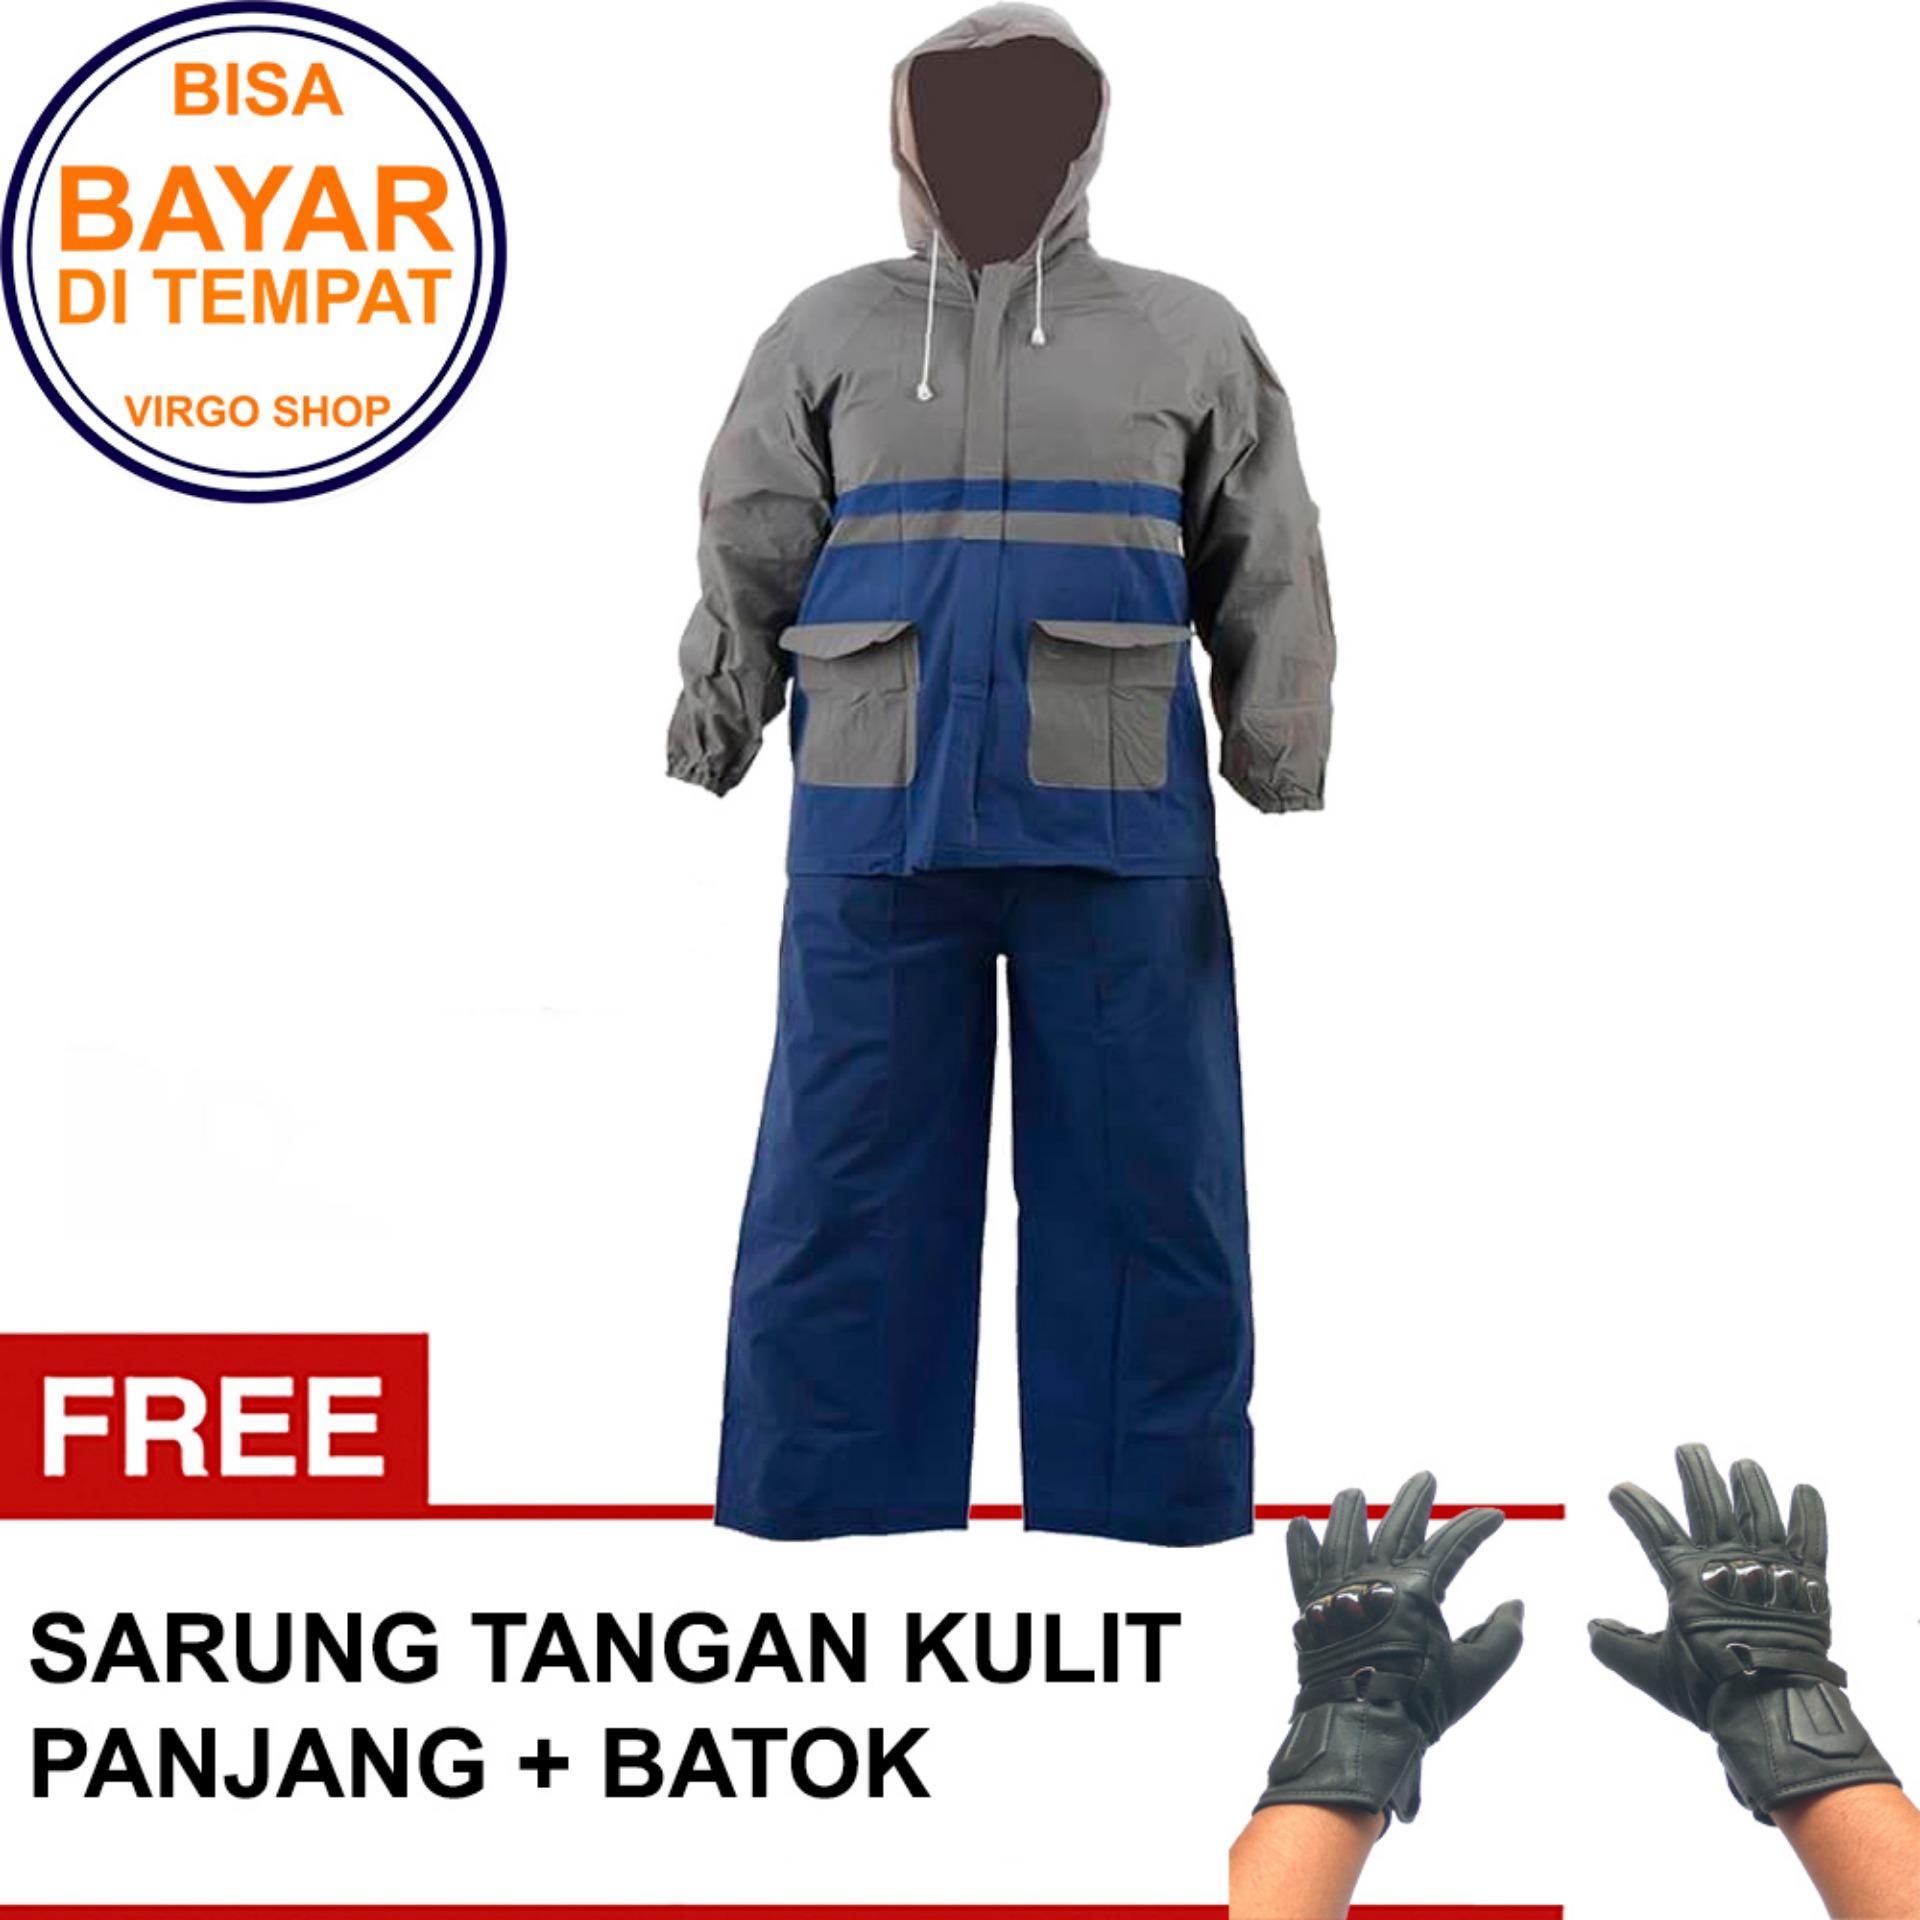 Elephant Jas Hujan Jaket Celana Abu abu - Biru Bonus sarung tangan Kulit Full Panjang Batok